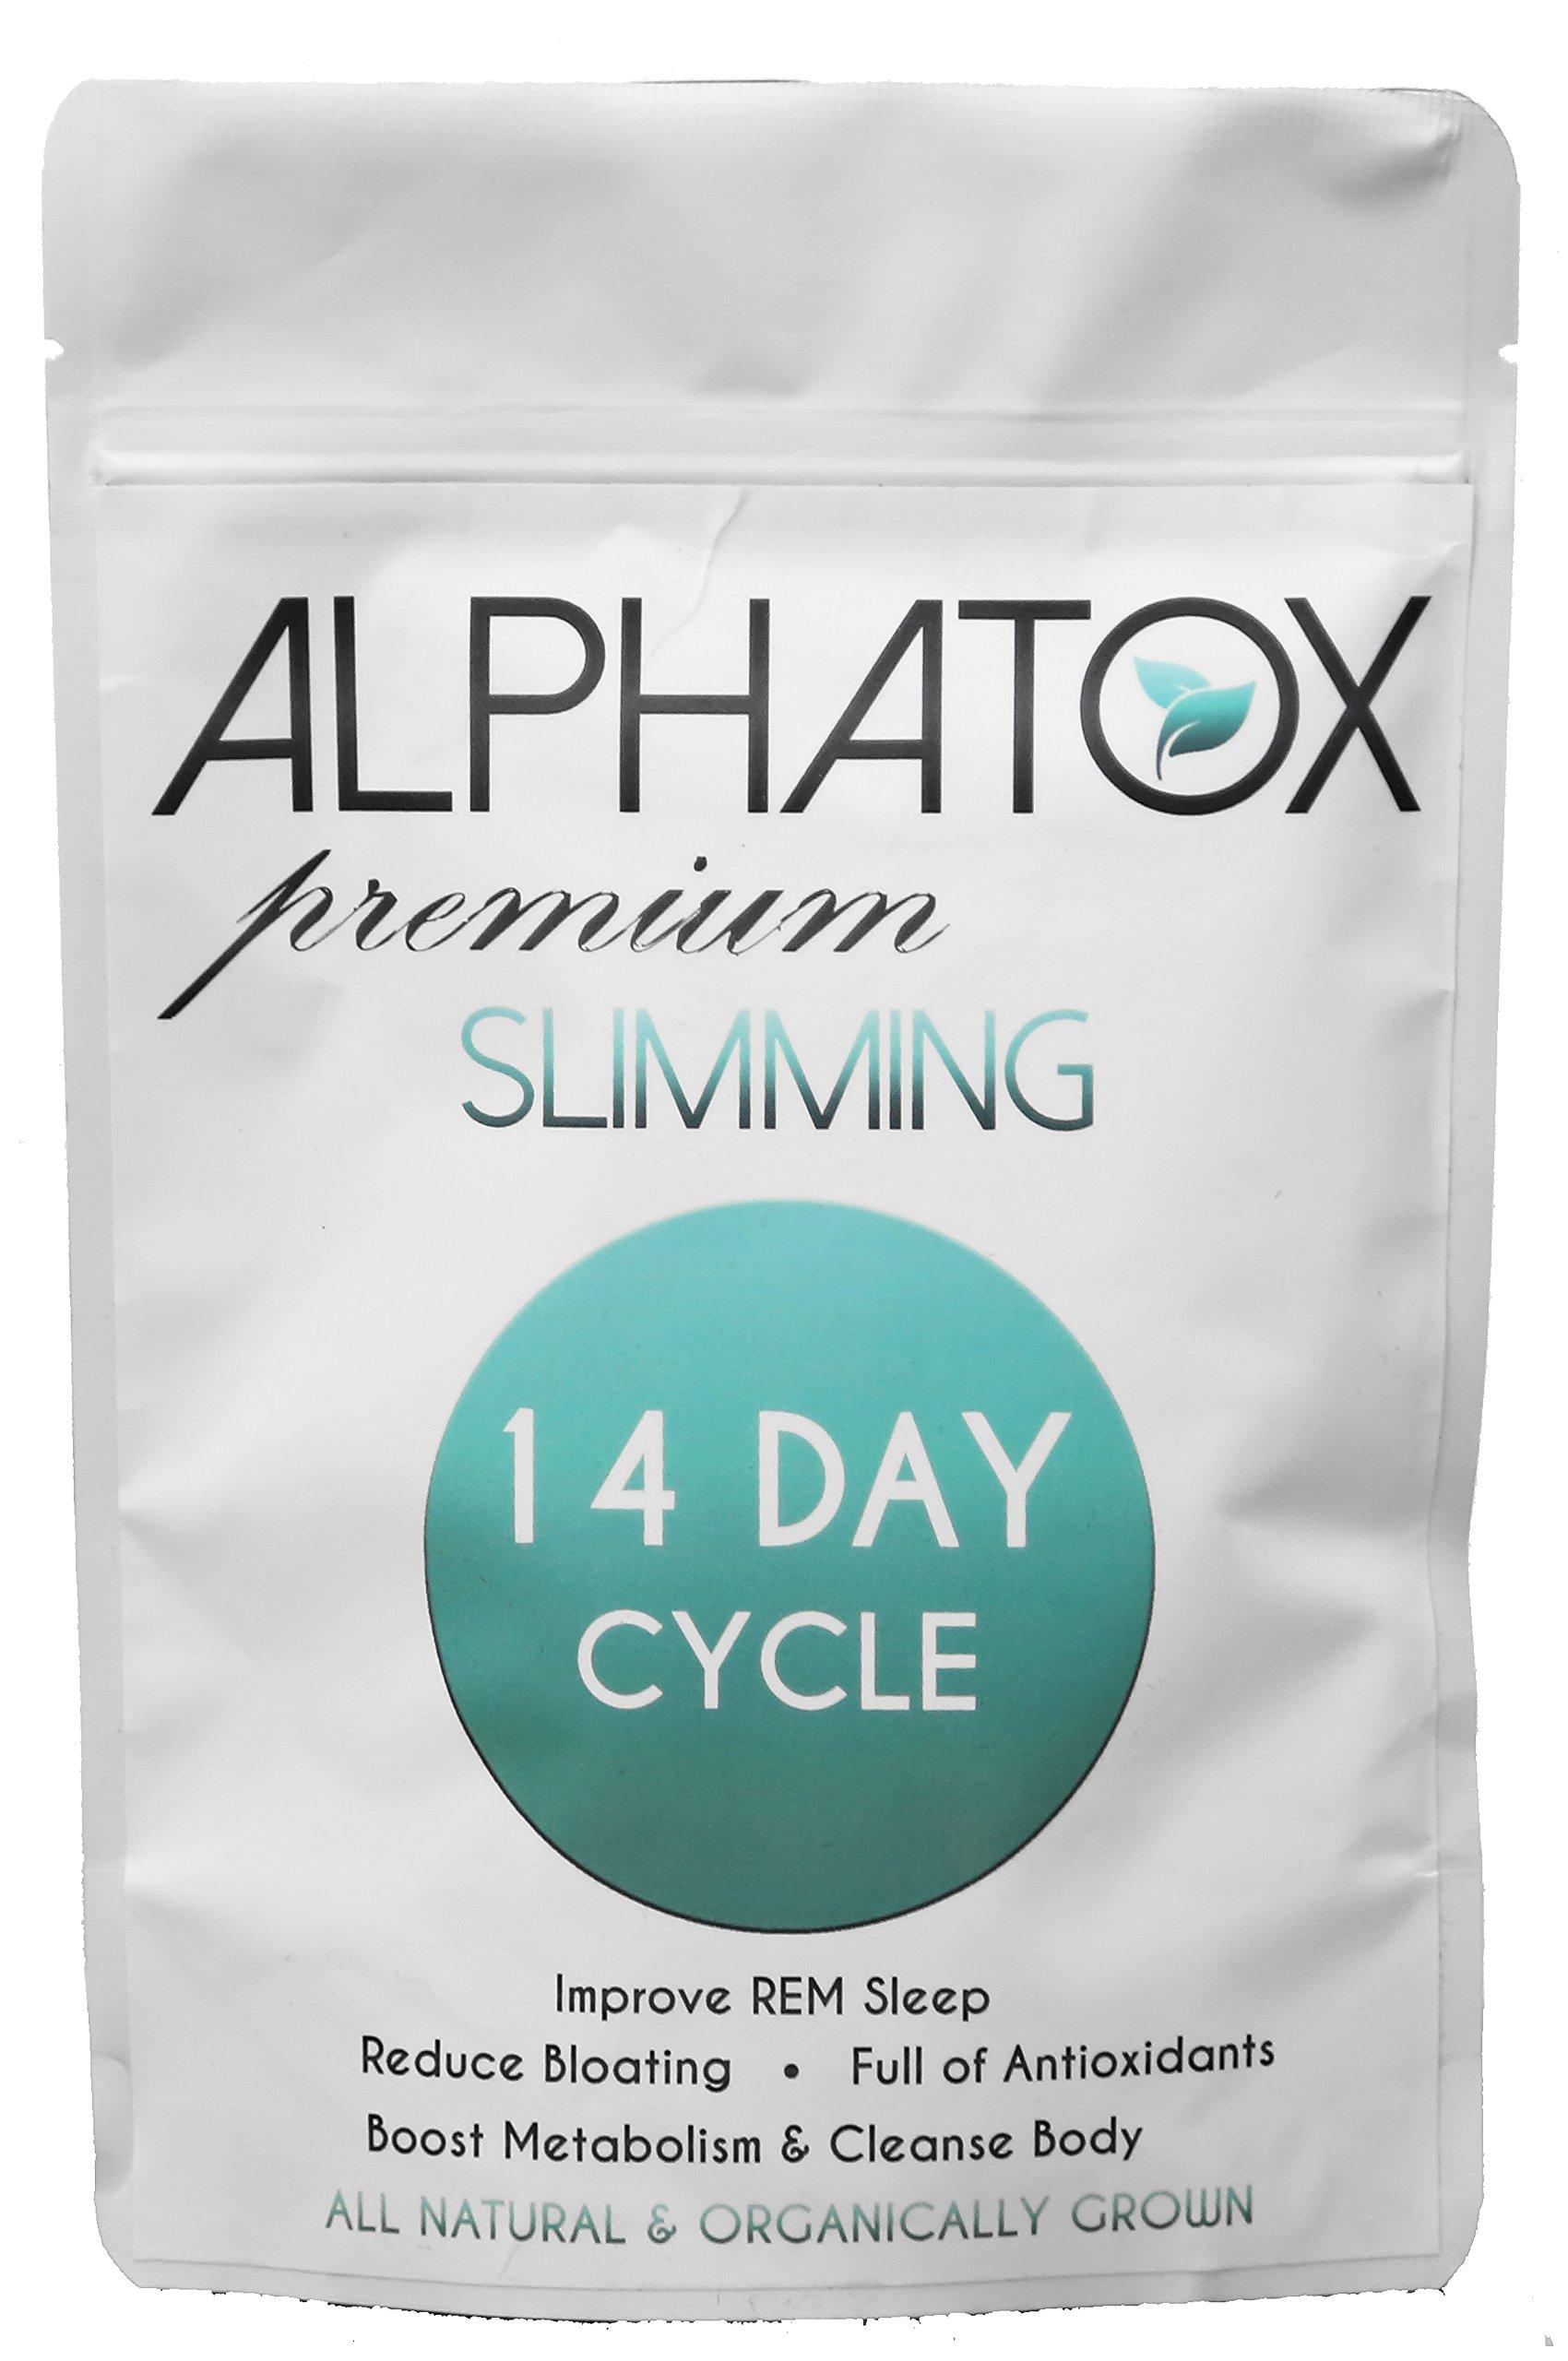 Alphatox 14 Day Premium Slimming Tea Cycle | Lose Weight Naturally, Reduce Bloating and Improve Rem Sleep | 14 Herbal Tea Bags | Organic Tea | Full of Anti-Oxidants